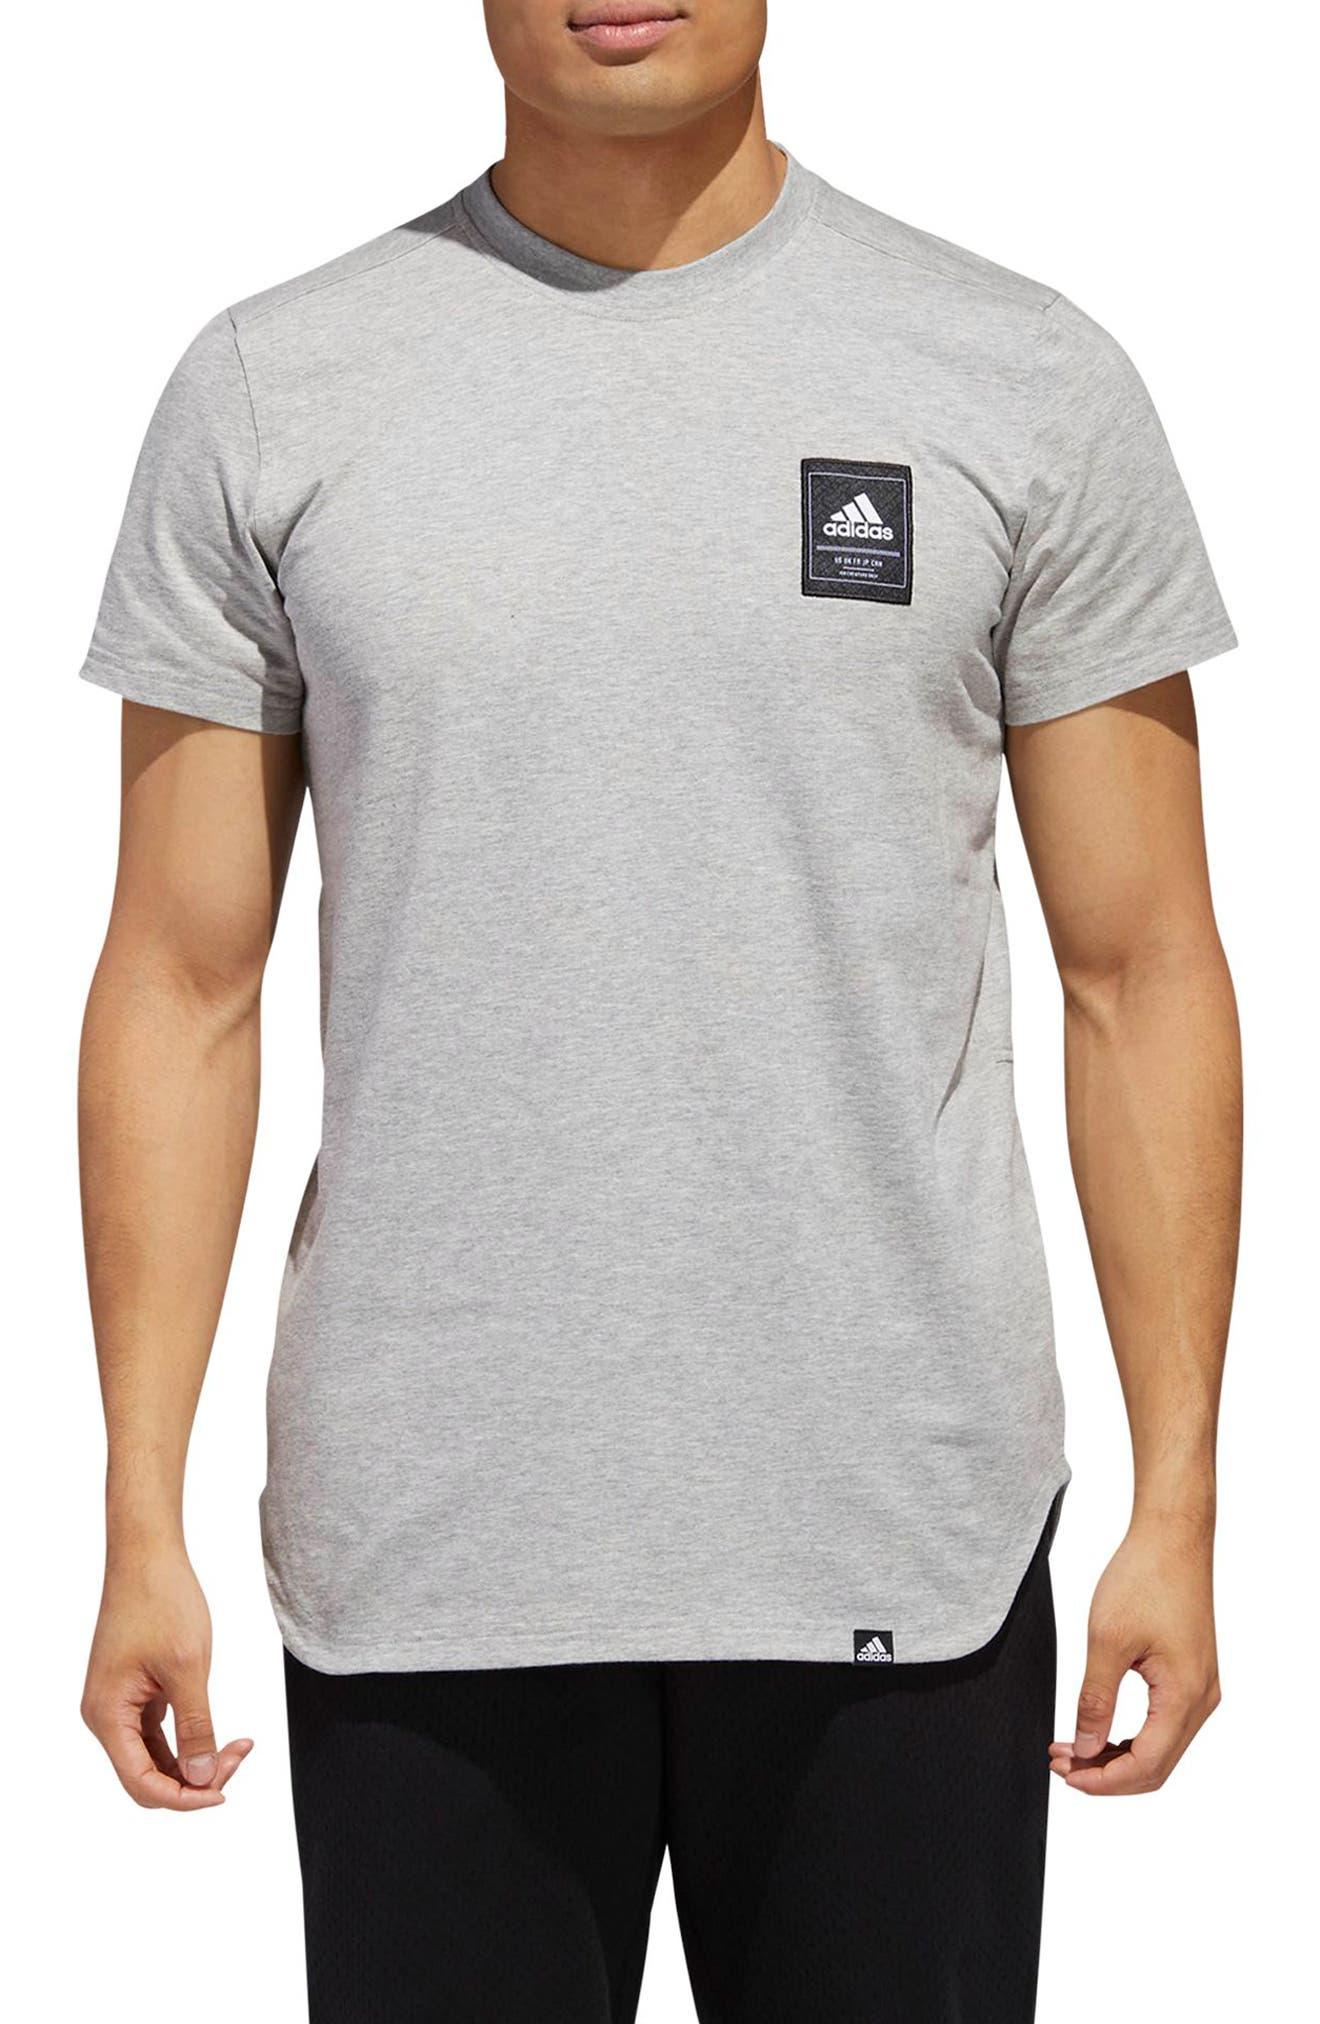 Scoop International T-Shirt,                             Main thumbnail 1, color,                             MEDIUM GREY HEATHER